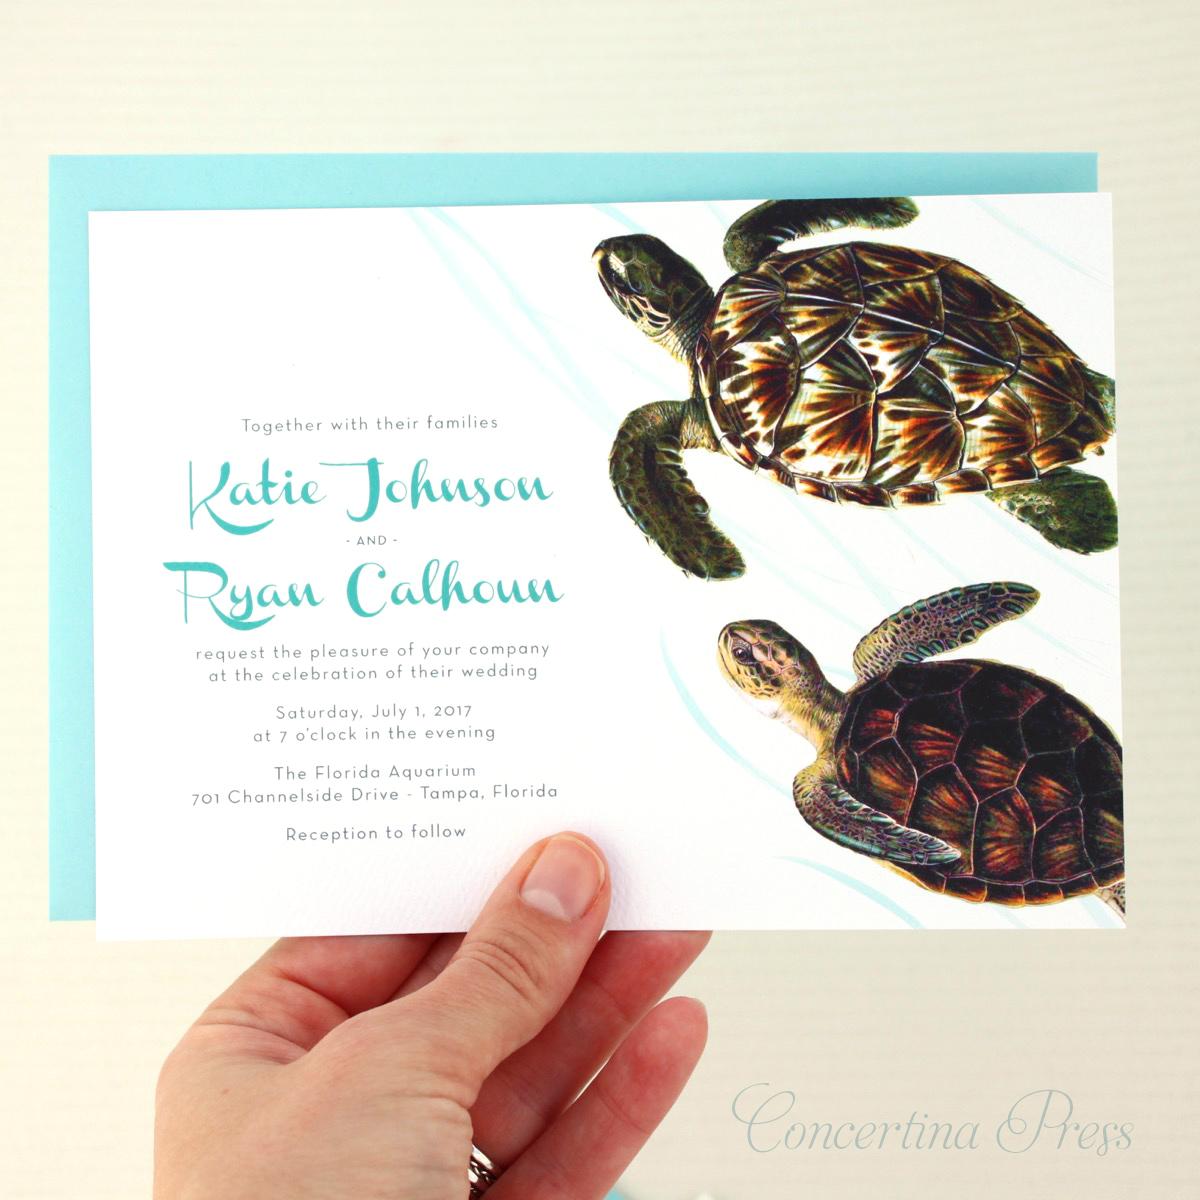 Sea Turtle Wedding Invitations: Stationery And Invitations: Sea Turtle